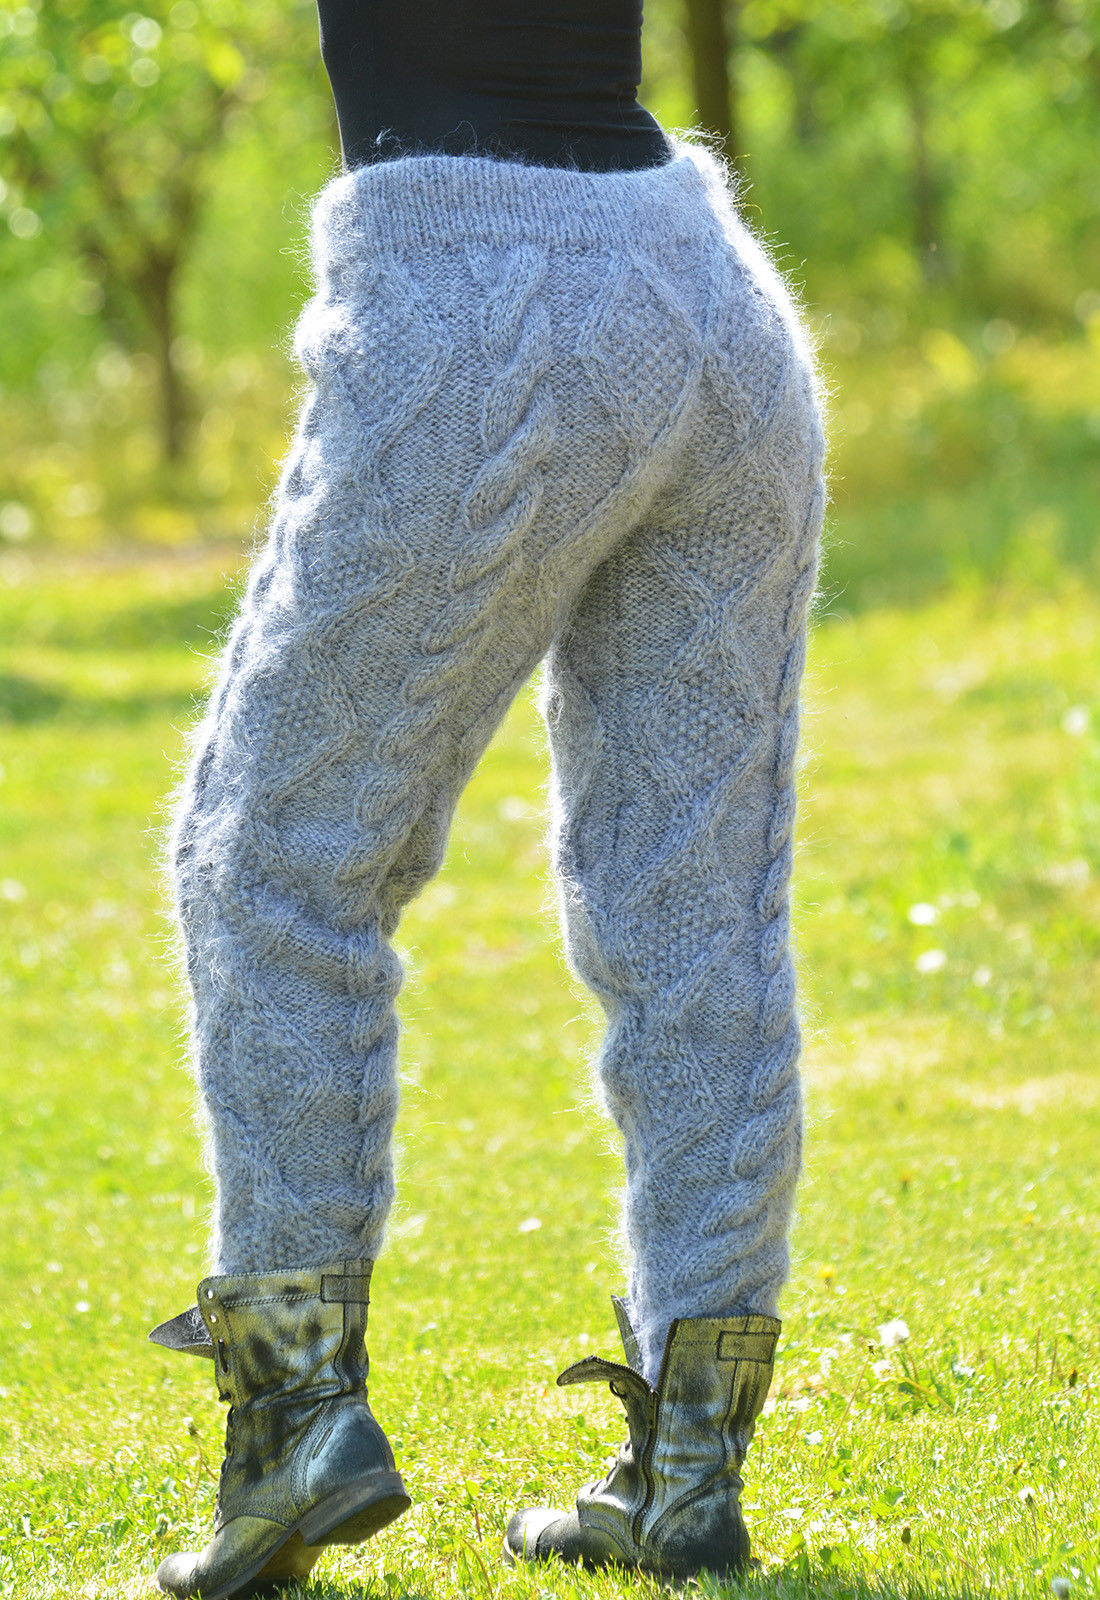 69223970_pants-cable-fuzzy-legwarmers-3.jpg